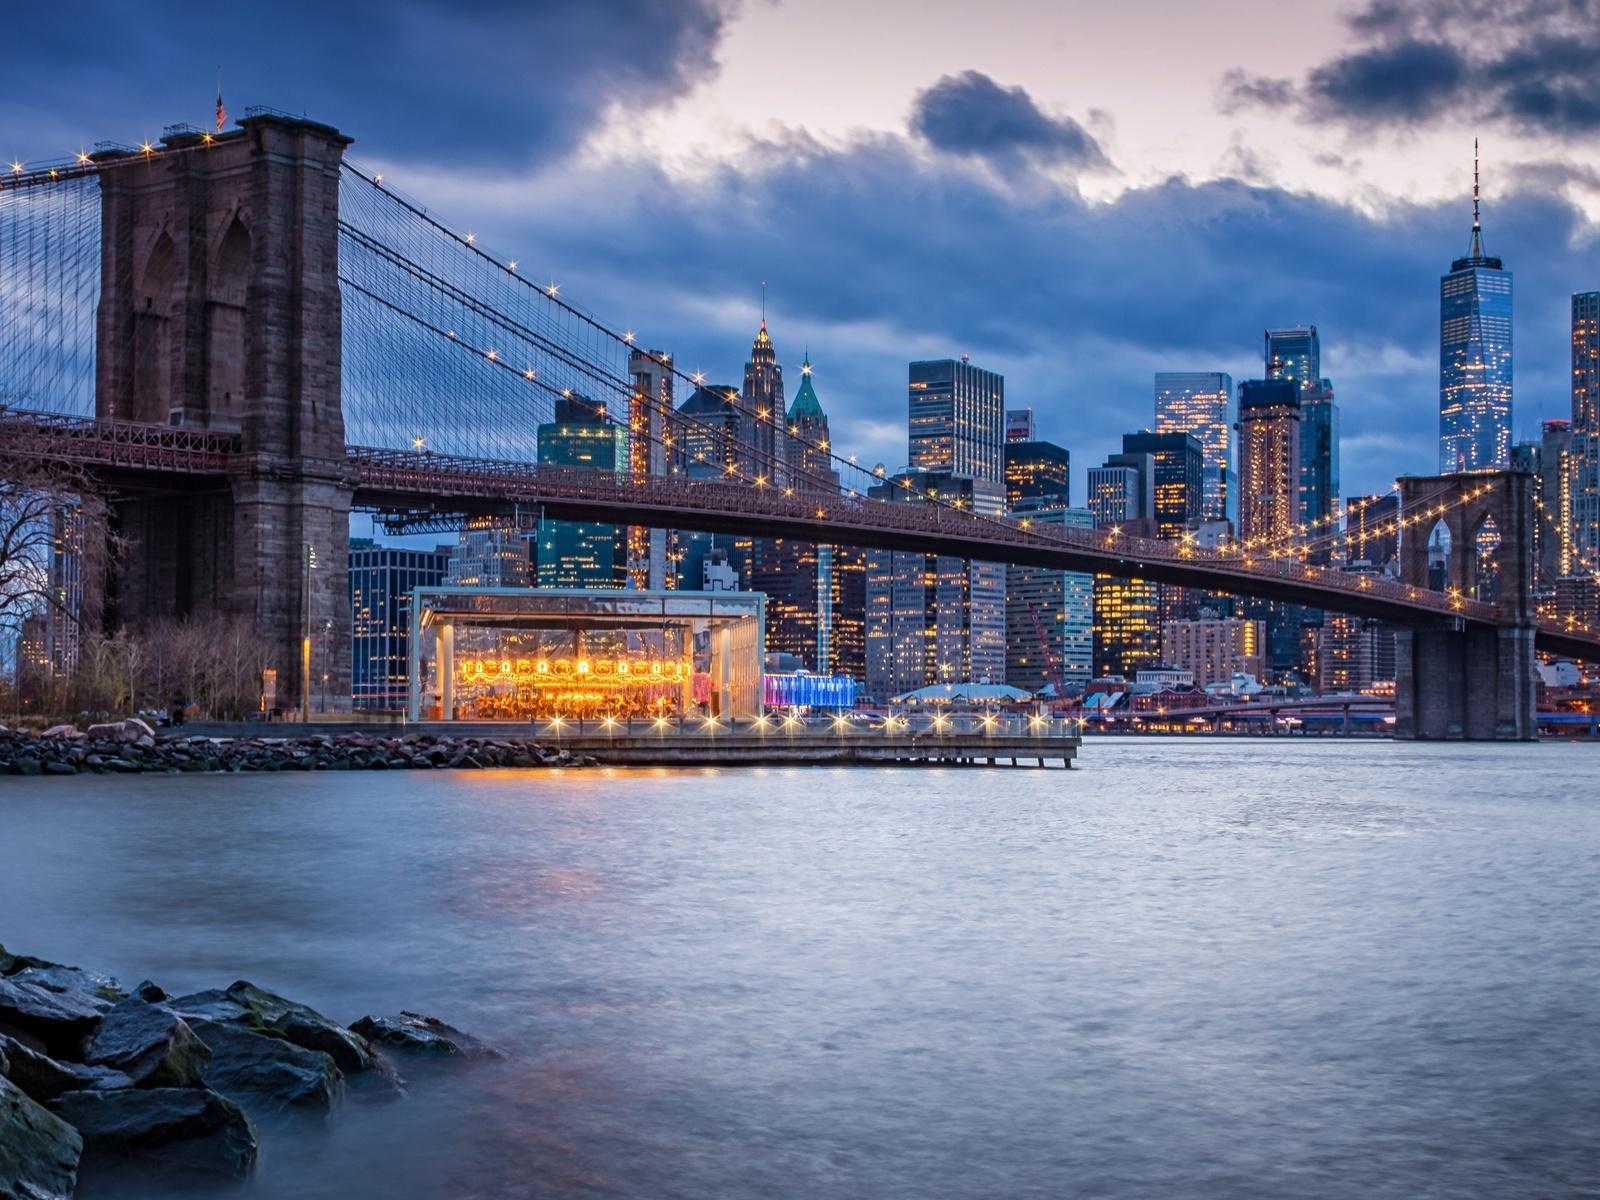 город, нью-йорк, new york, city, brooklyn bridge, бруклинский мост